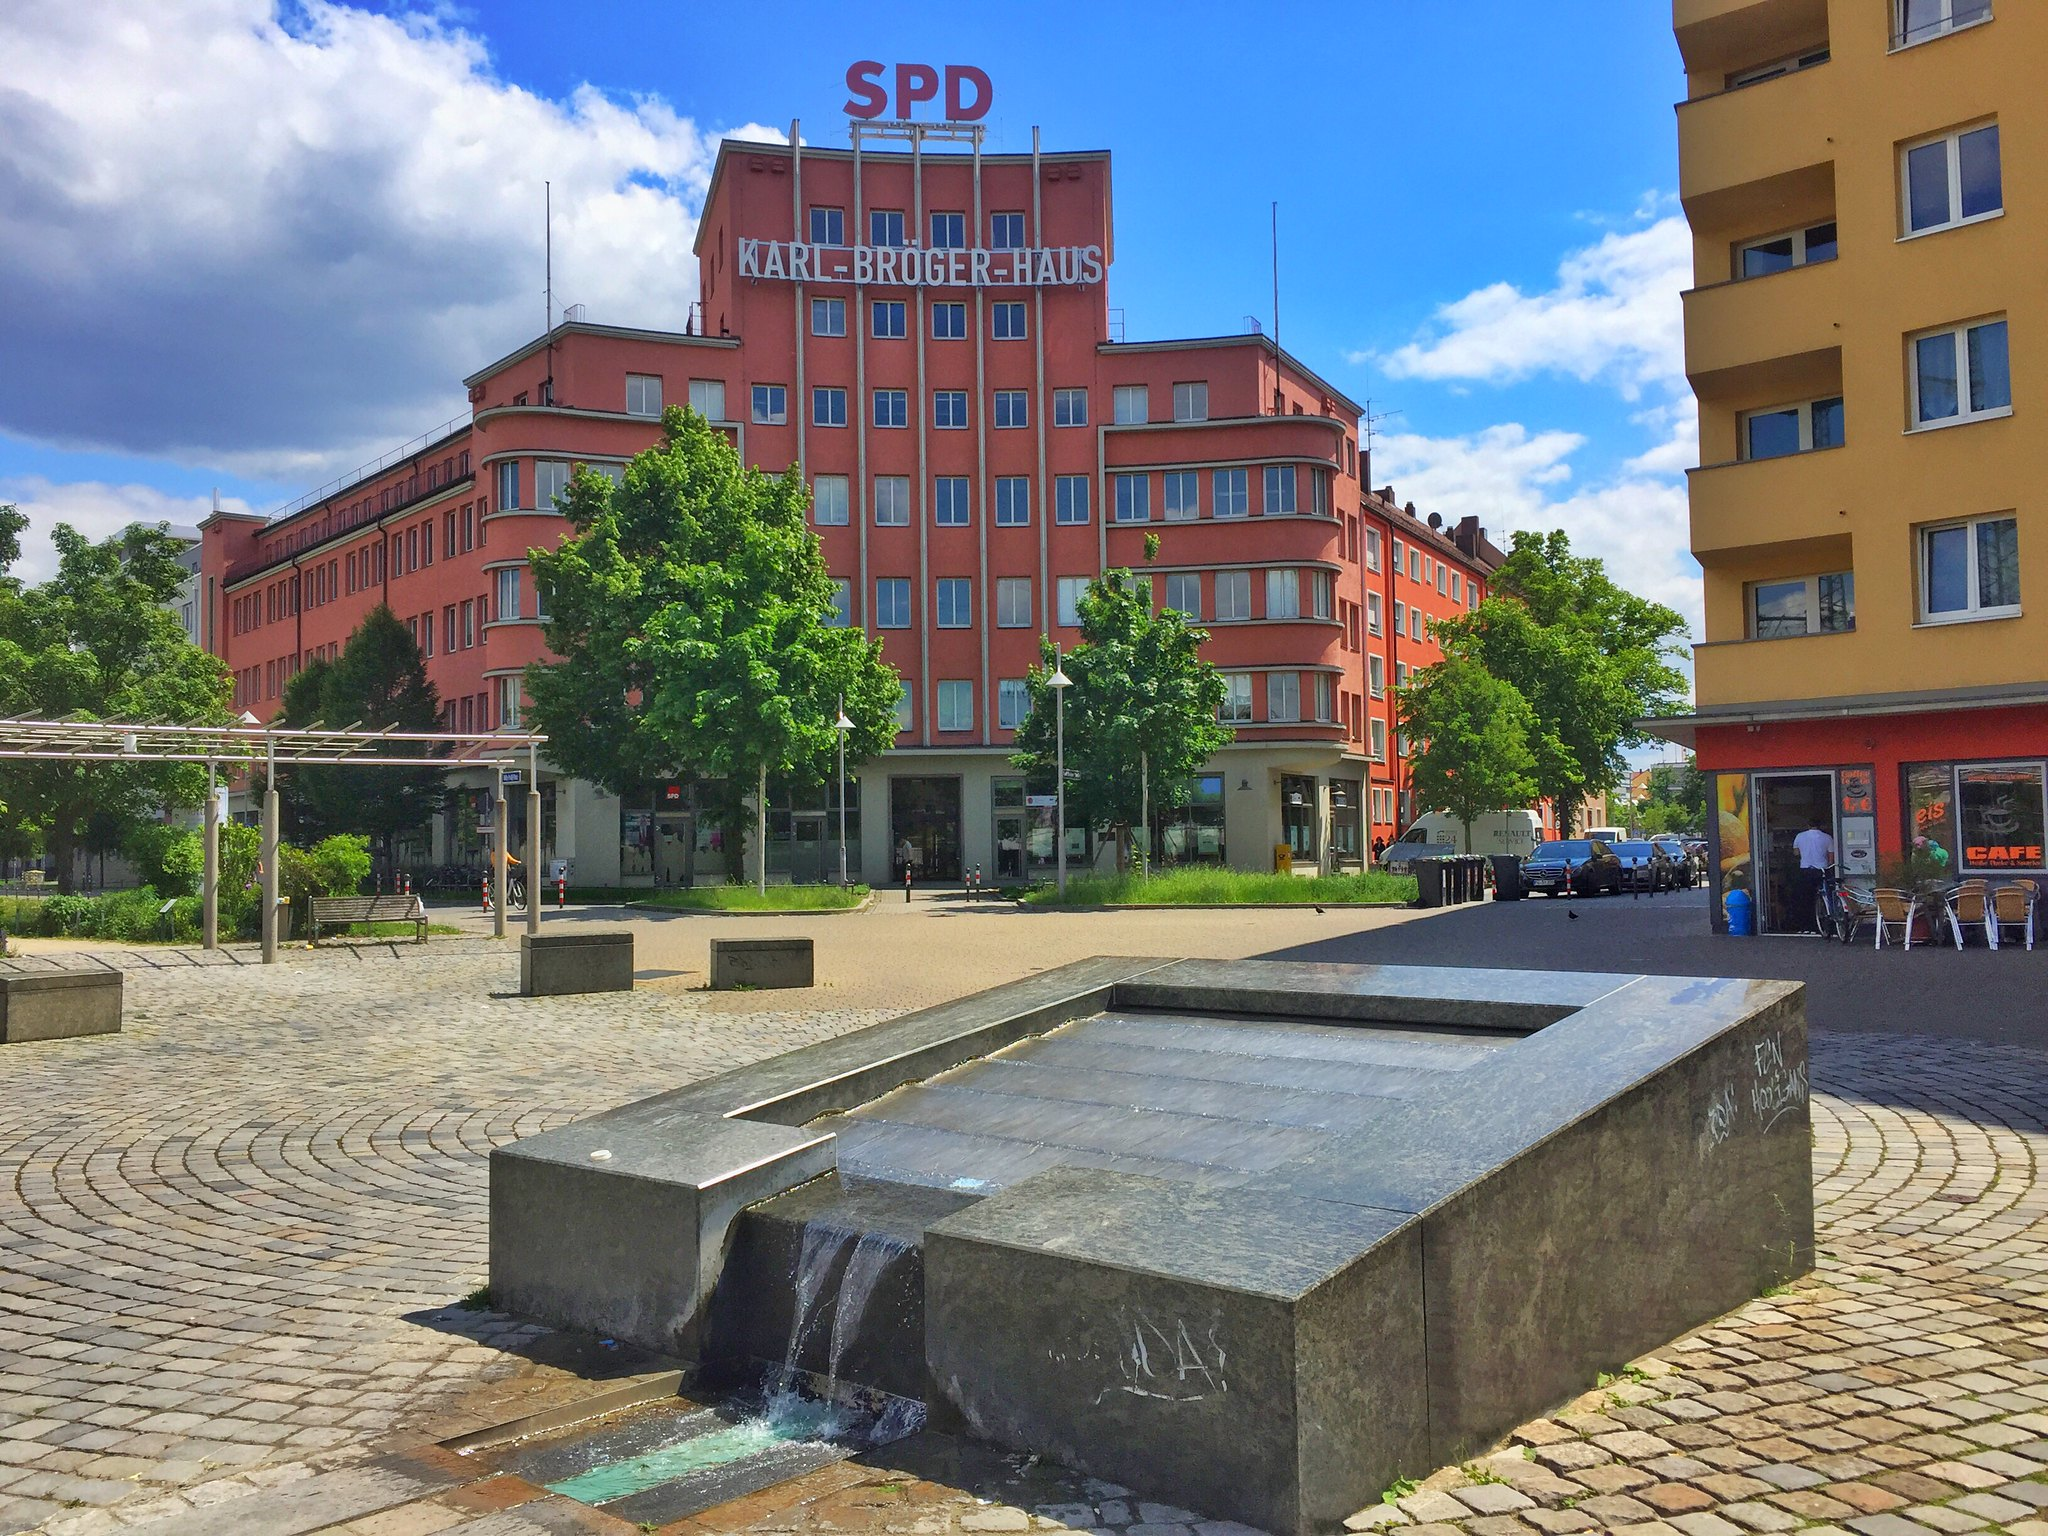 2017-05-21 - Südstadtpark #nbglove